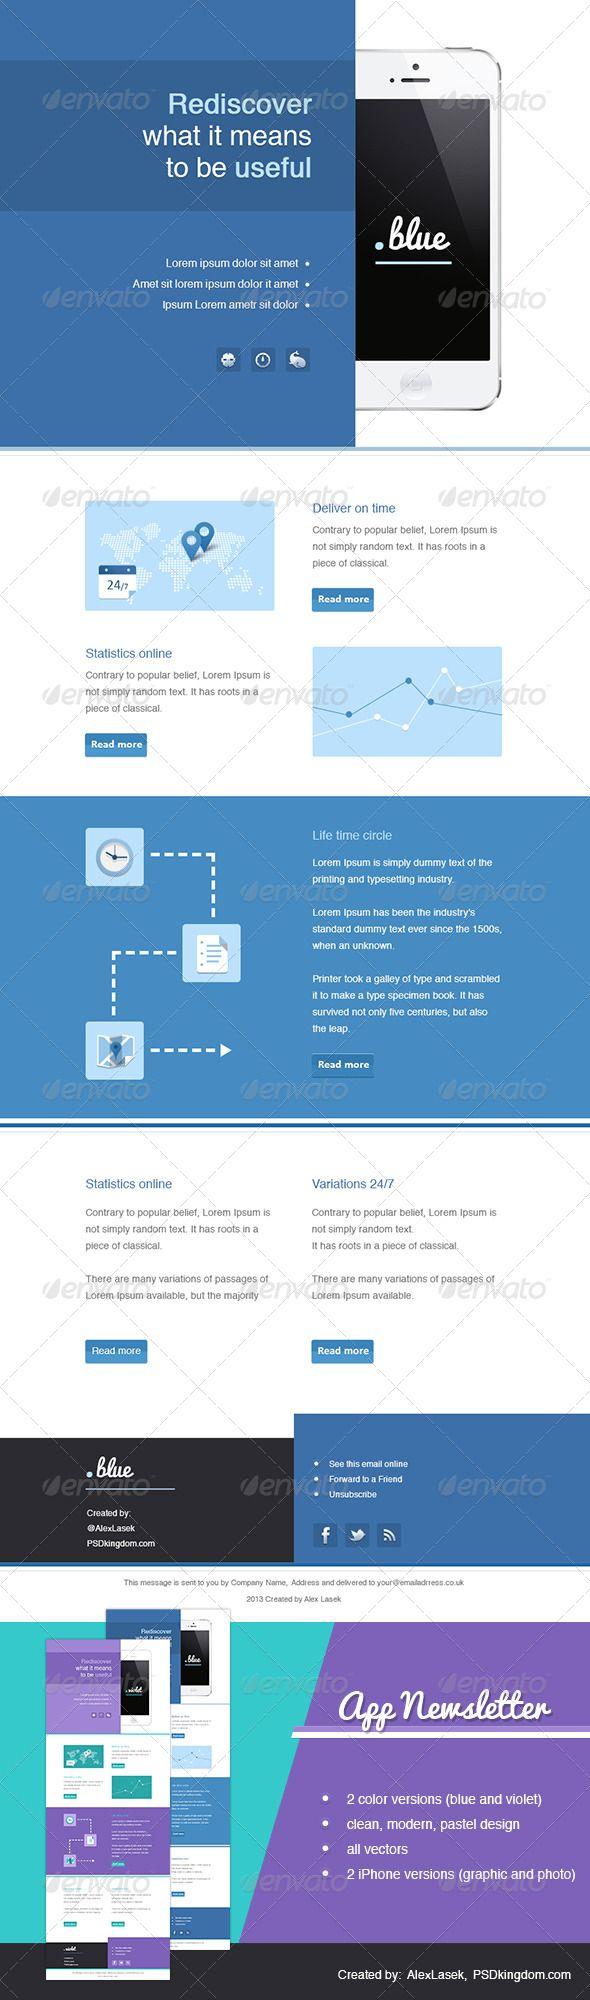 Random colors website -  App Enewsletter Templates Blue Violet E Newsletters Web